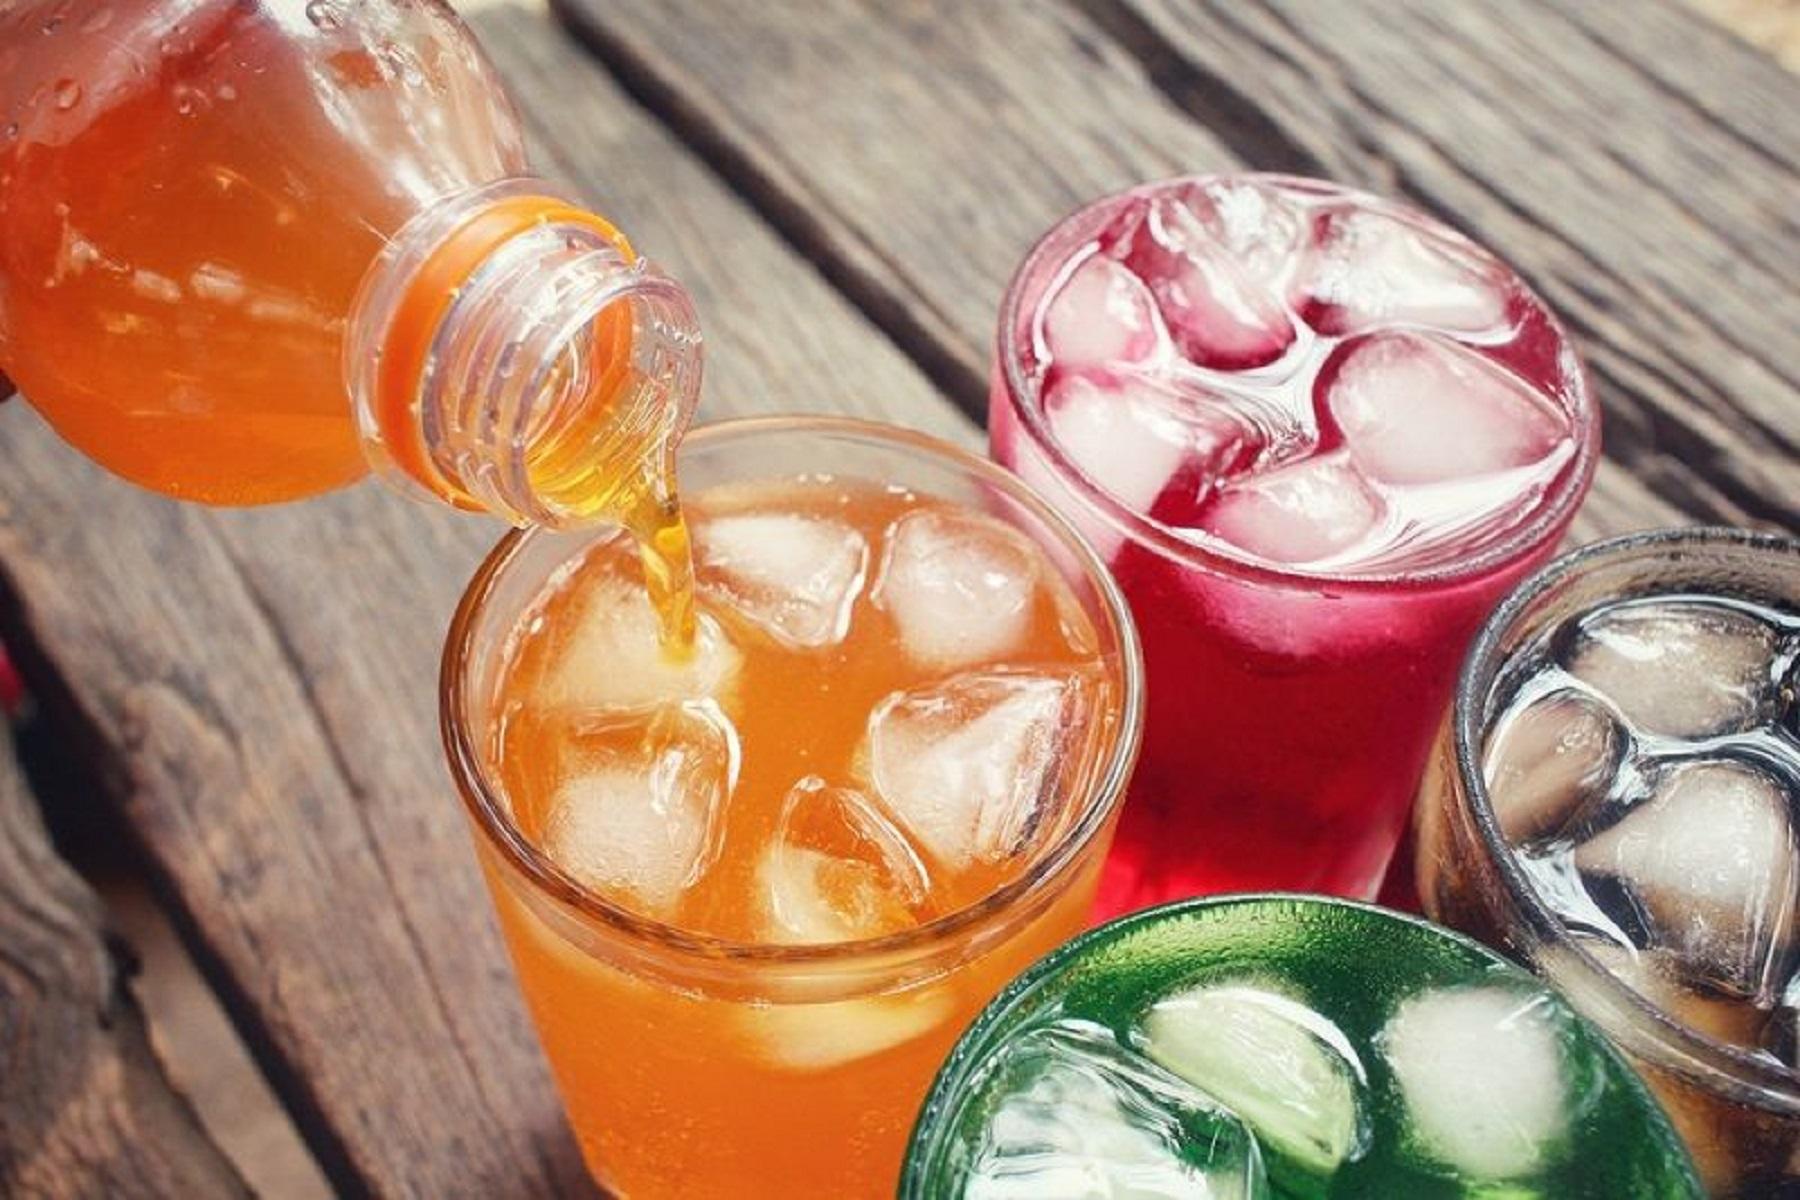 Mελέτη Καρκίνος: Ανησυχητική τάση μεταξύ εφήβων σε έντονα ζαχαρούχα ποτά